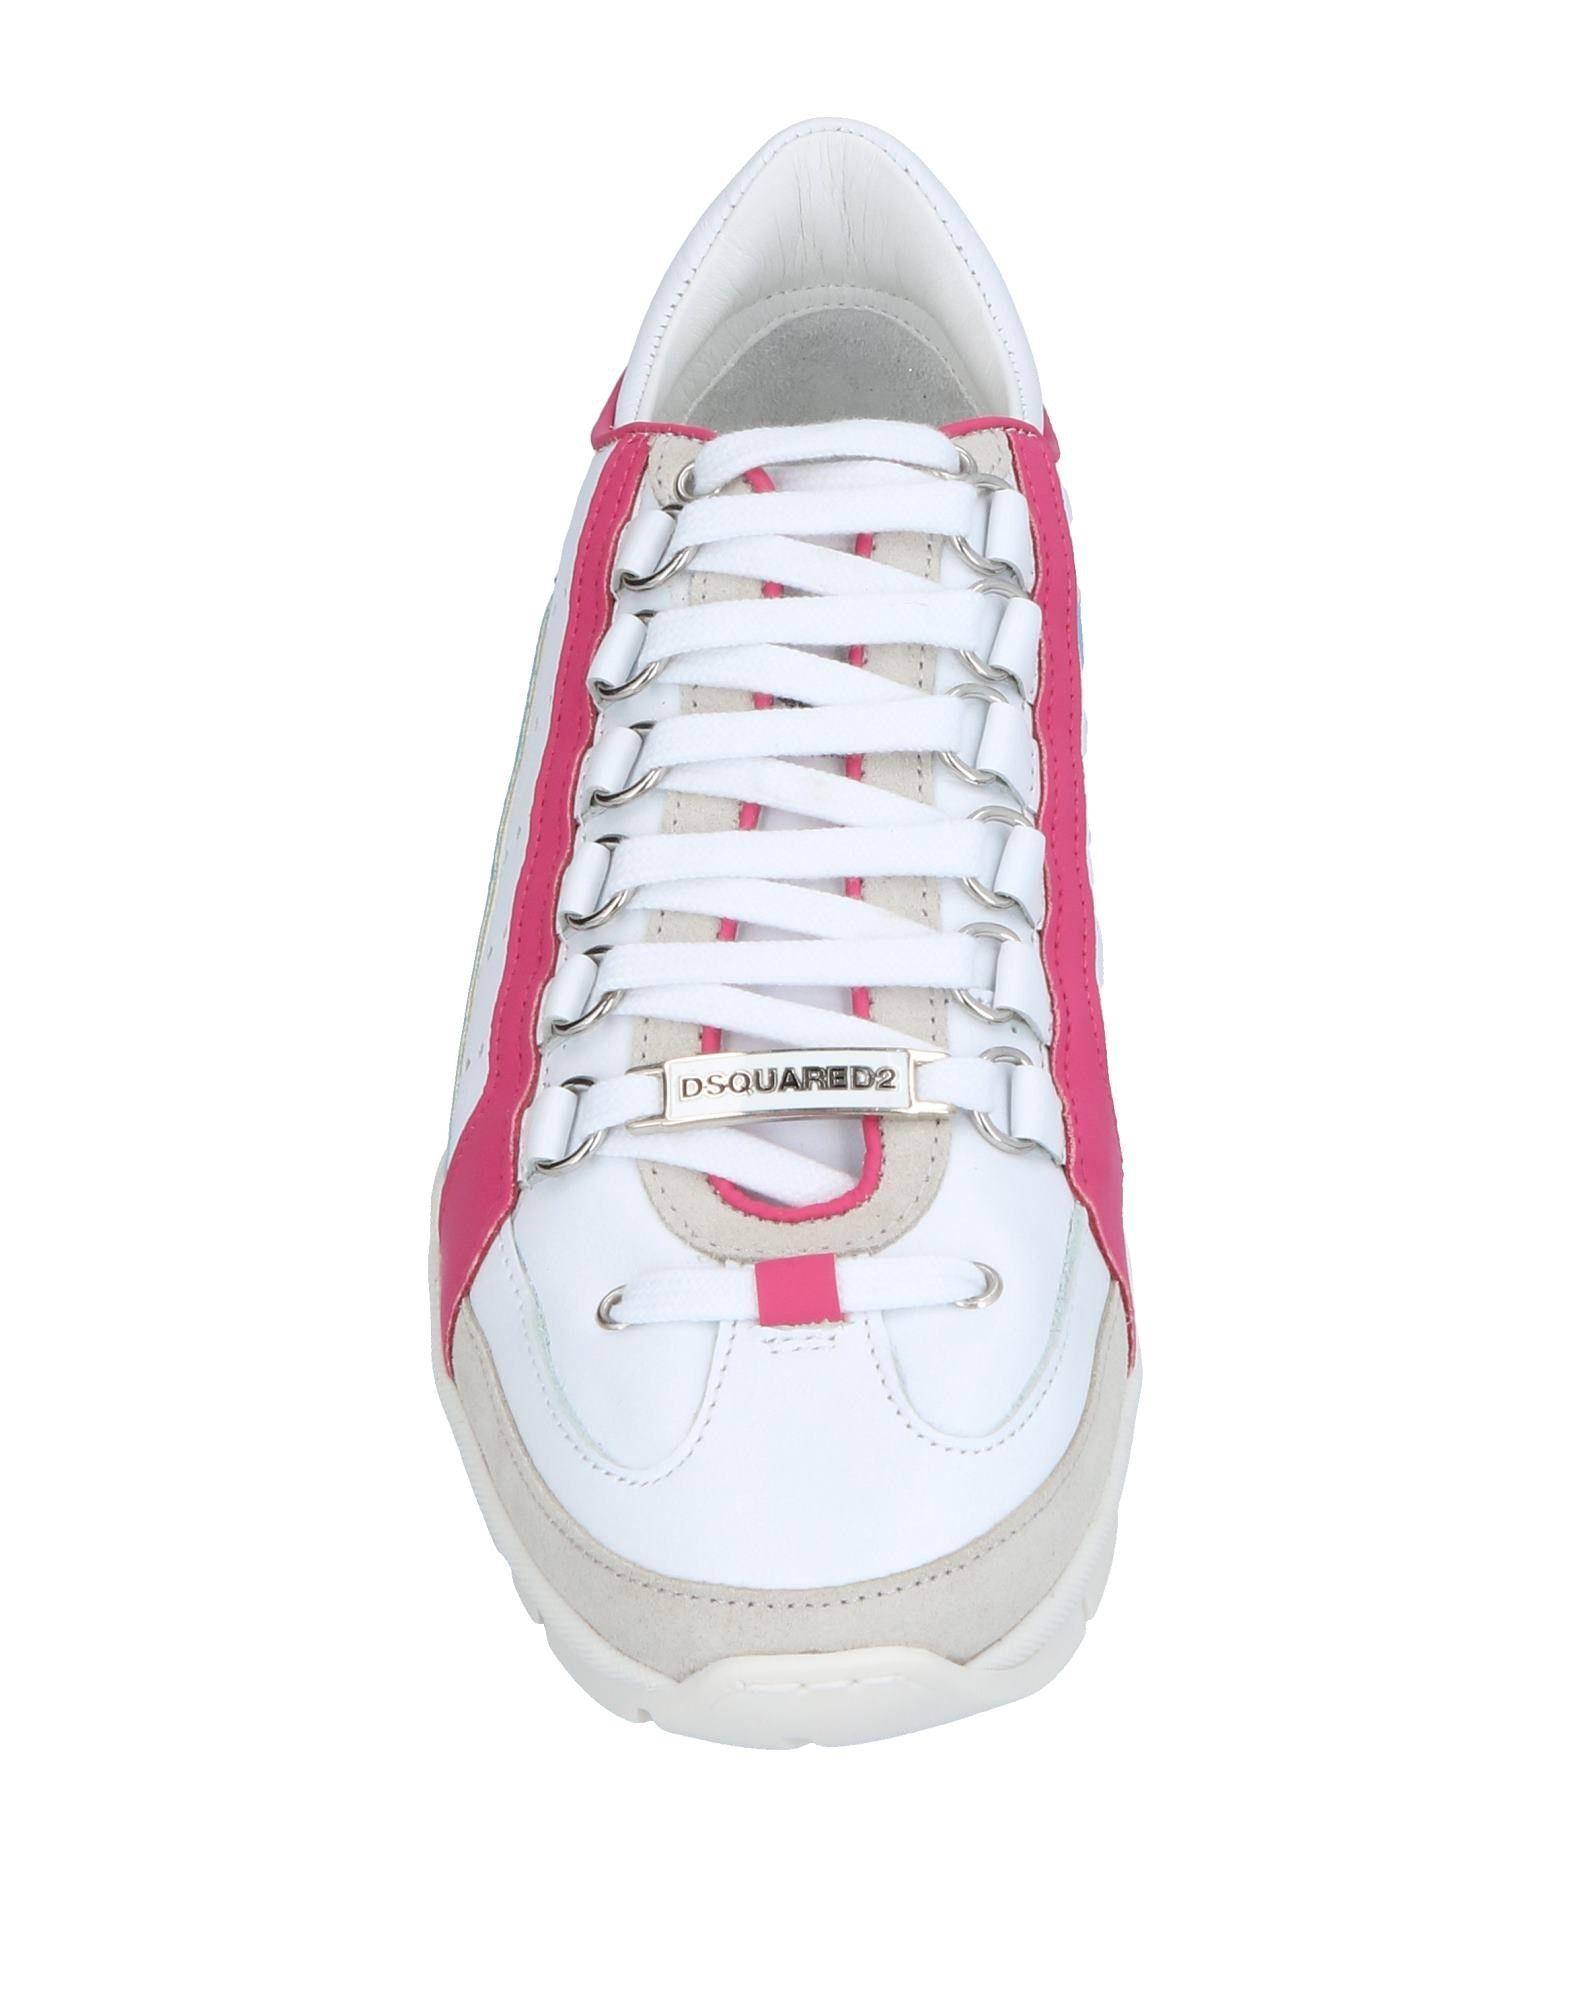 DsquaROT2 Damen Turnschuhes Damen DsquaROT2 11409486UKGut aussehende strapazierfähige Schuhe 0bbcdd